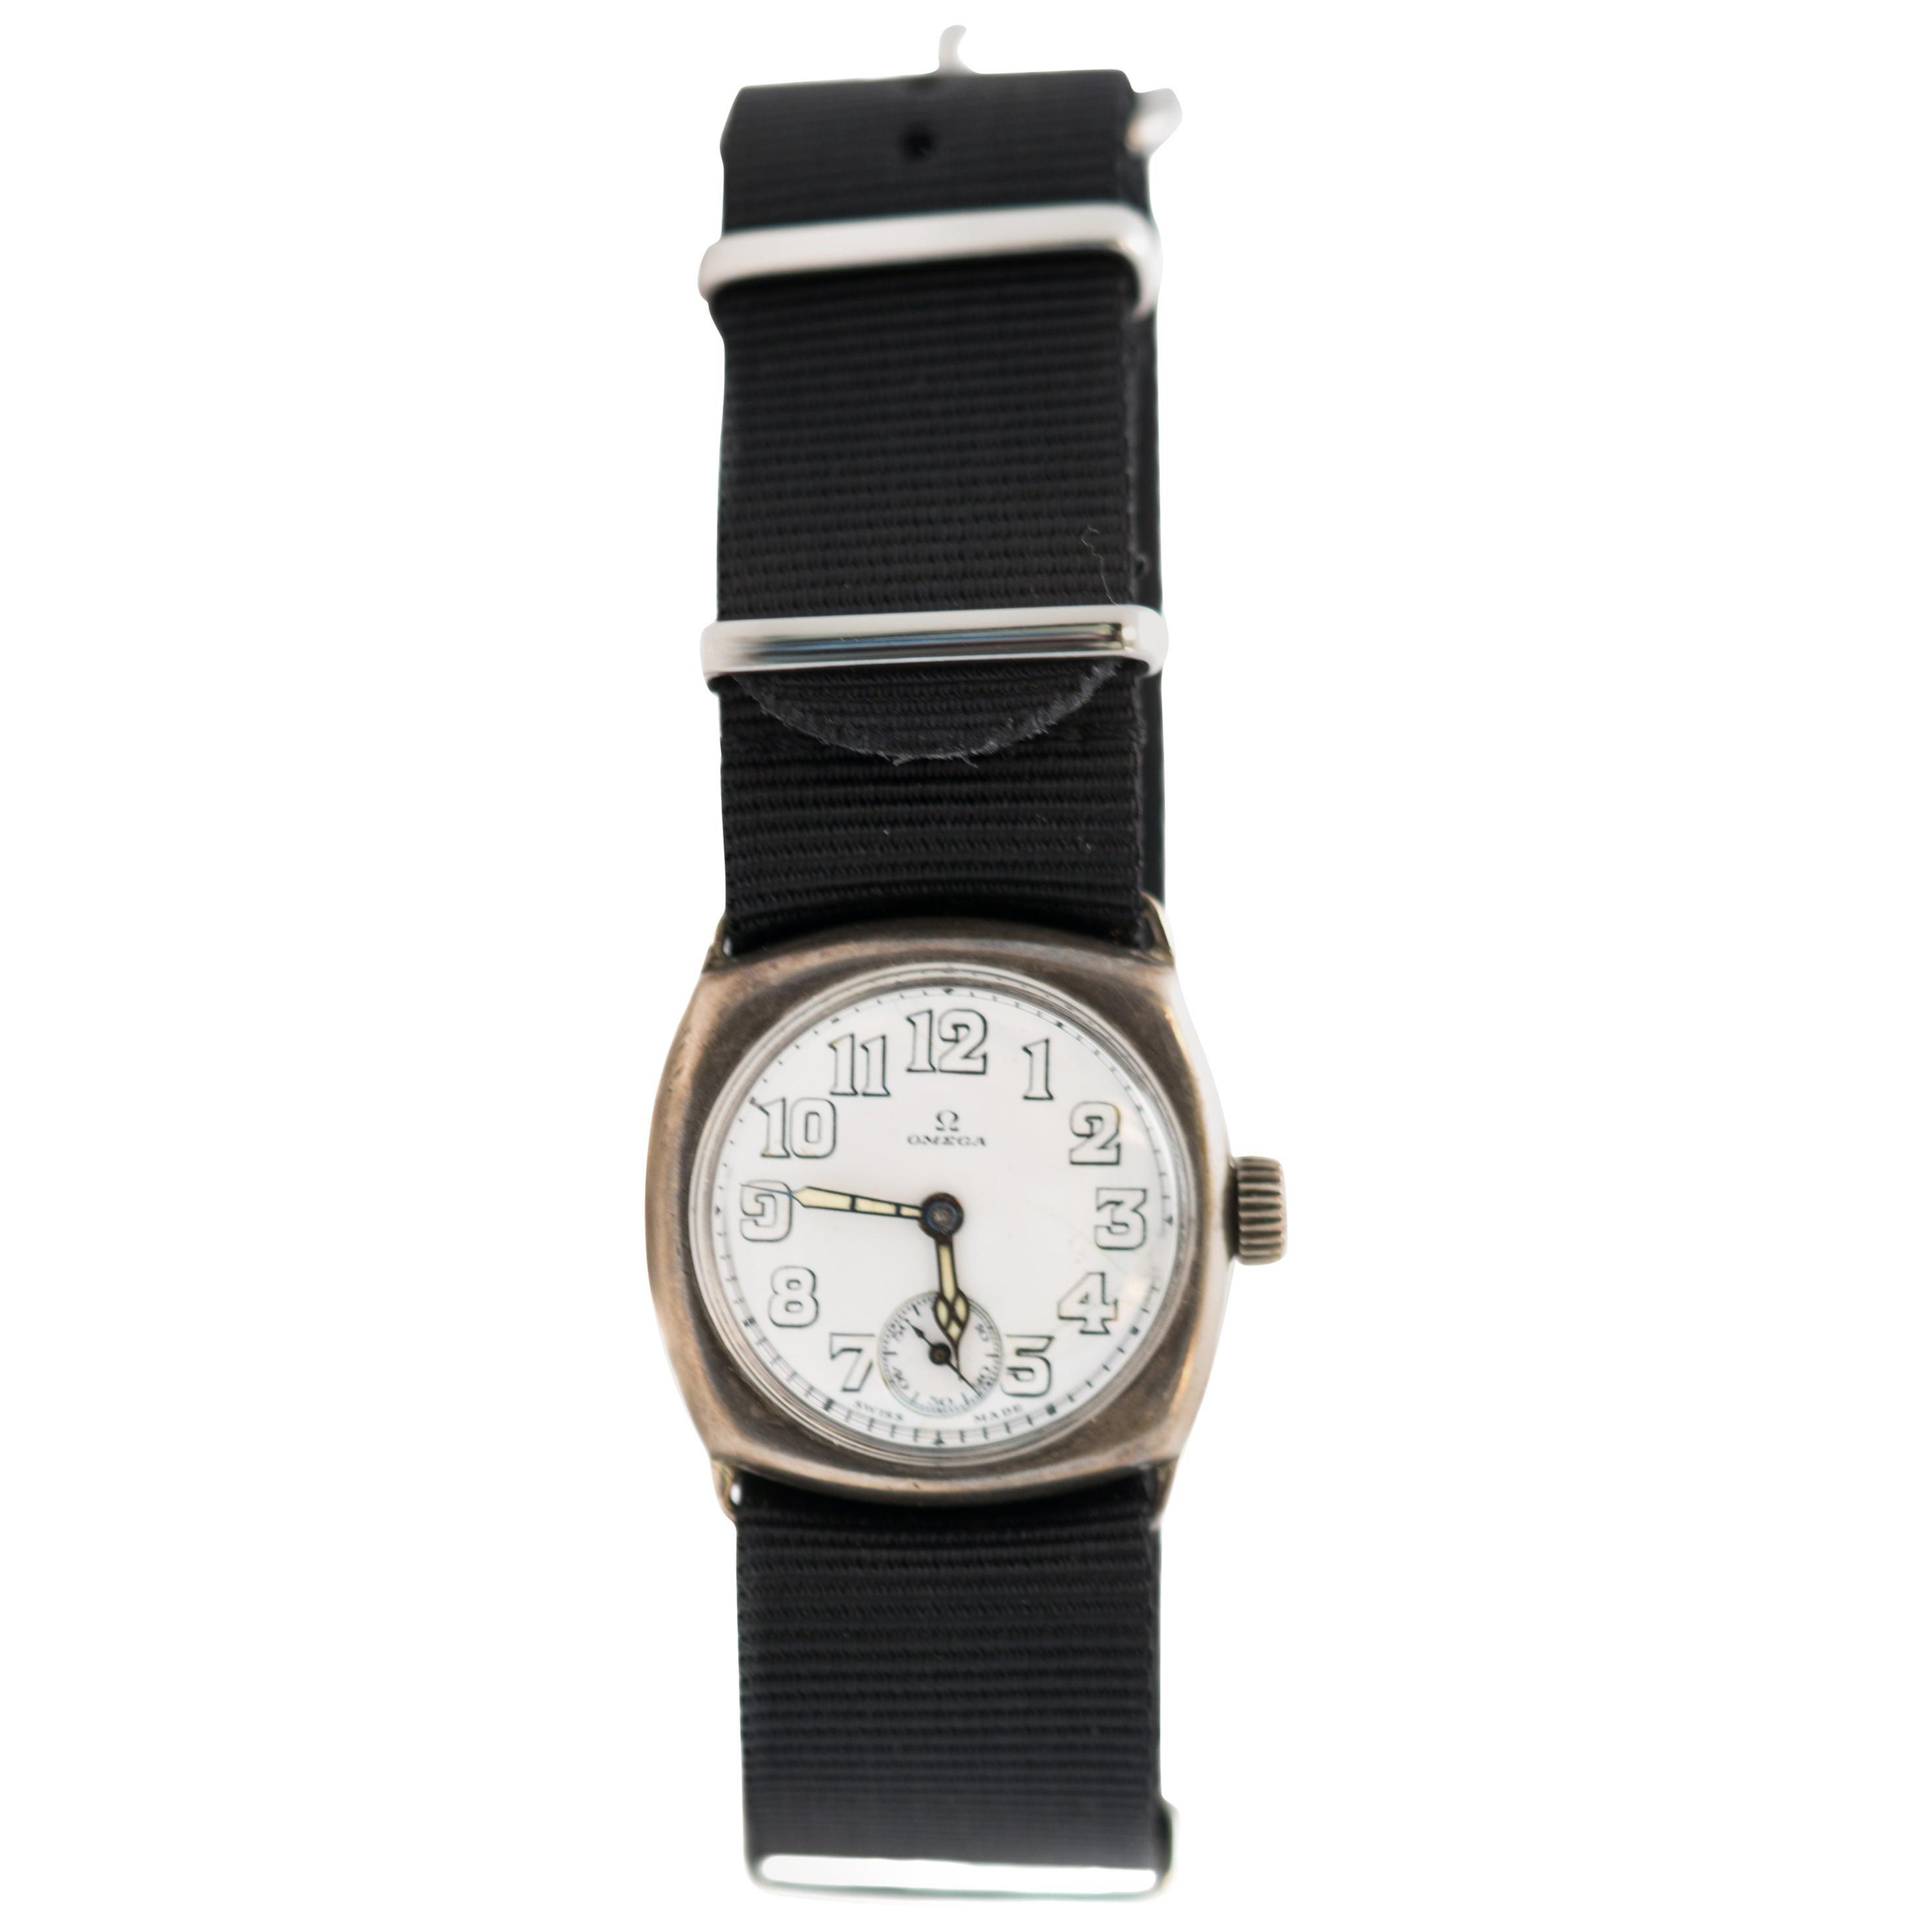 Omega Military Manual Wind Wristwatch, 1920s